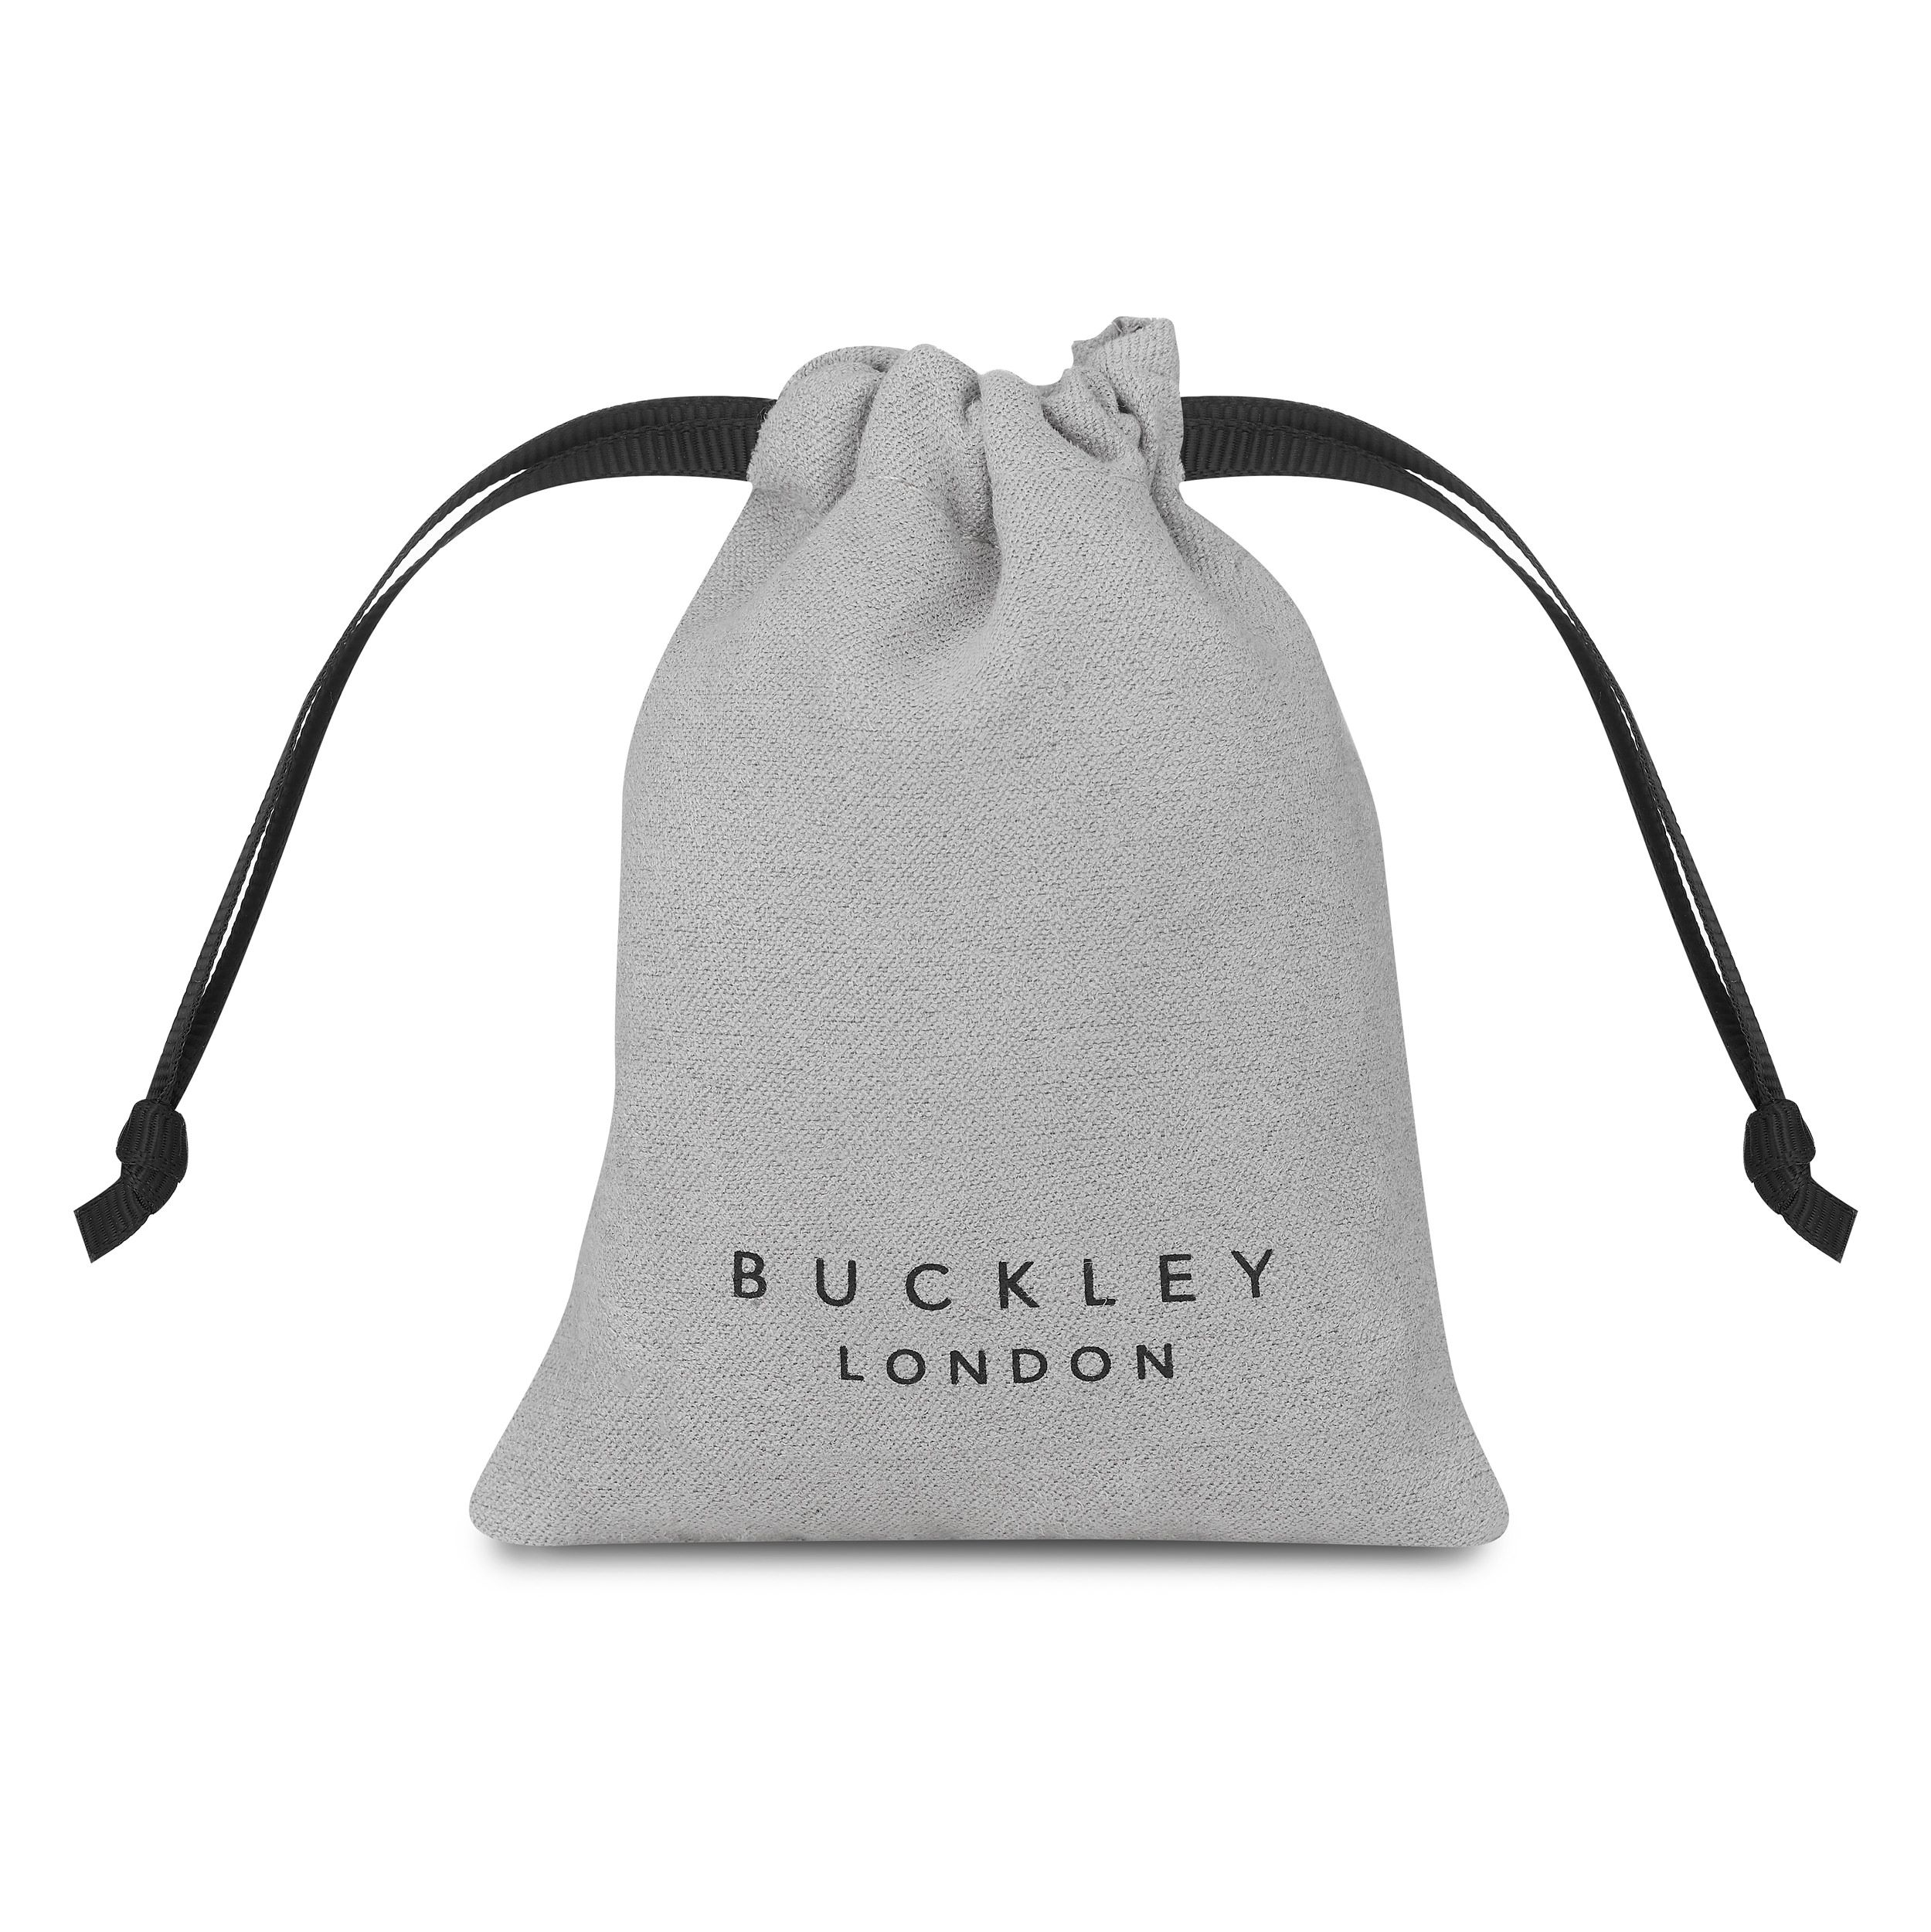 Buckley London Stellar Bangle - Silver Bag